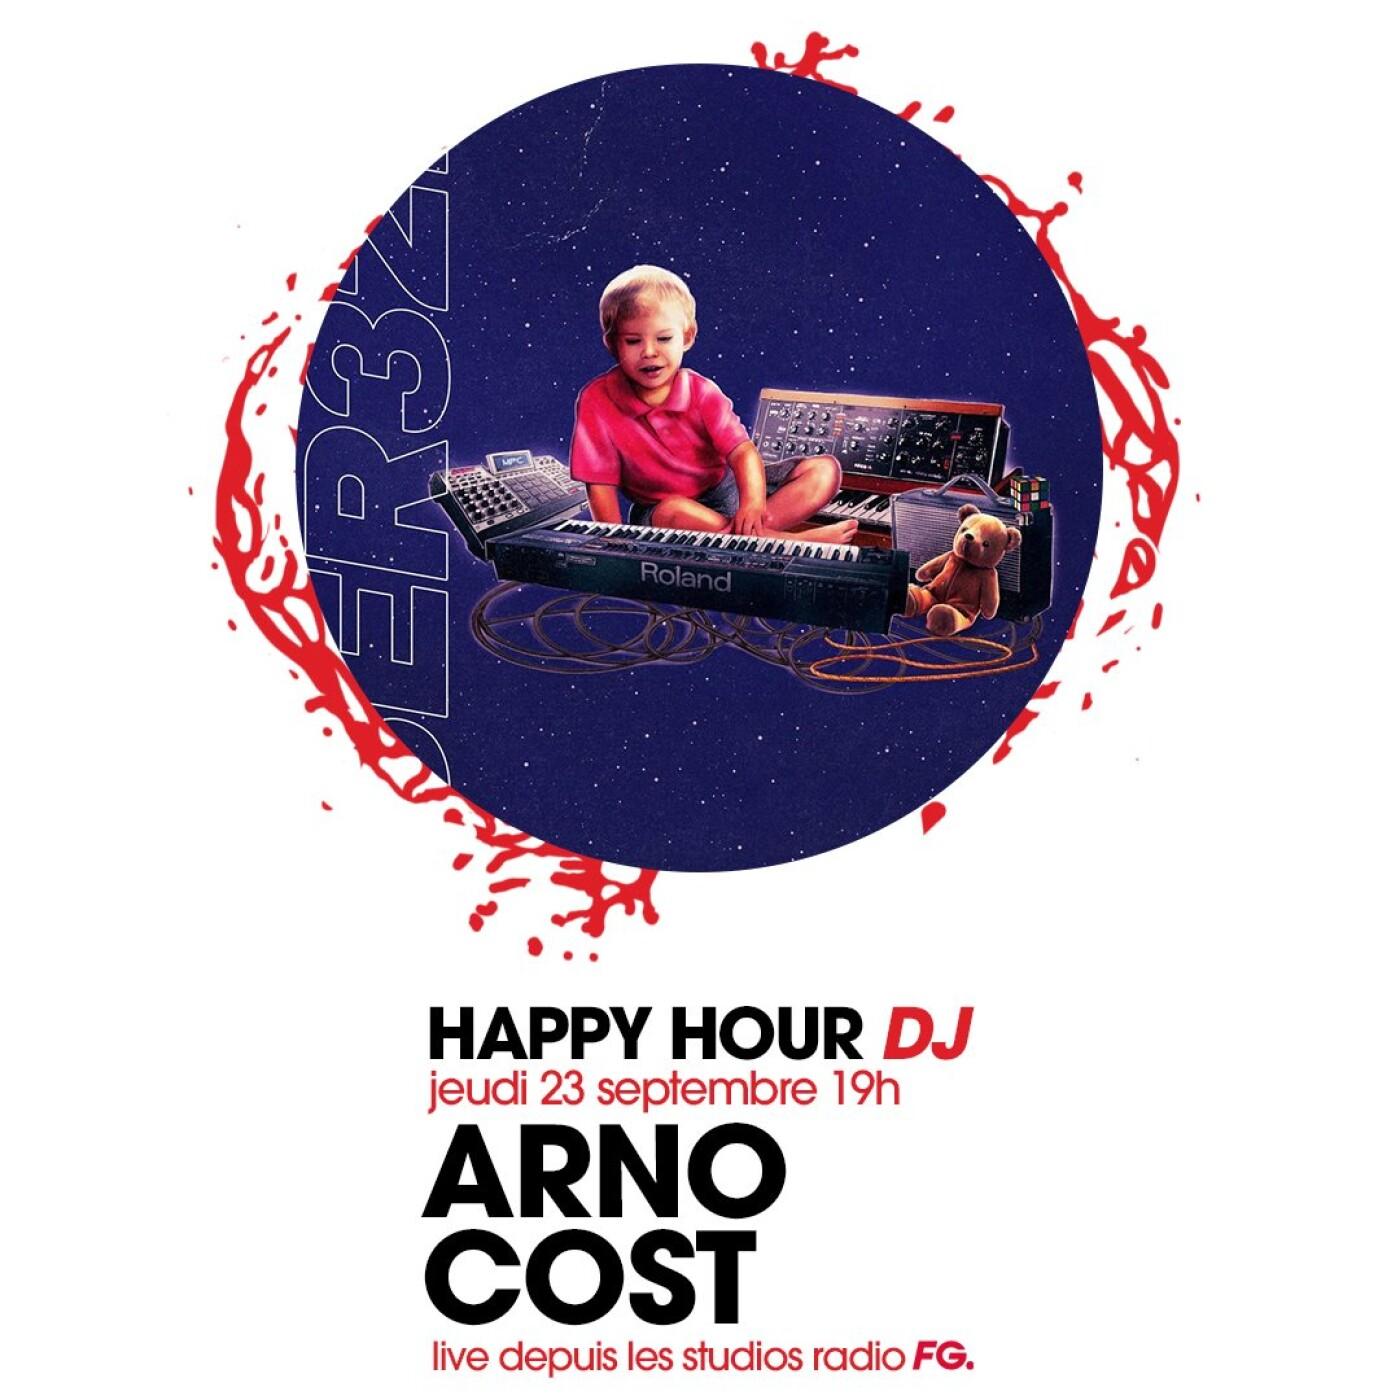 HAPPY HOUR DJ : ARNO COST